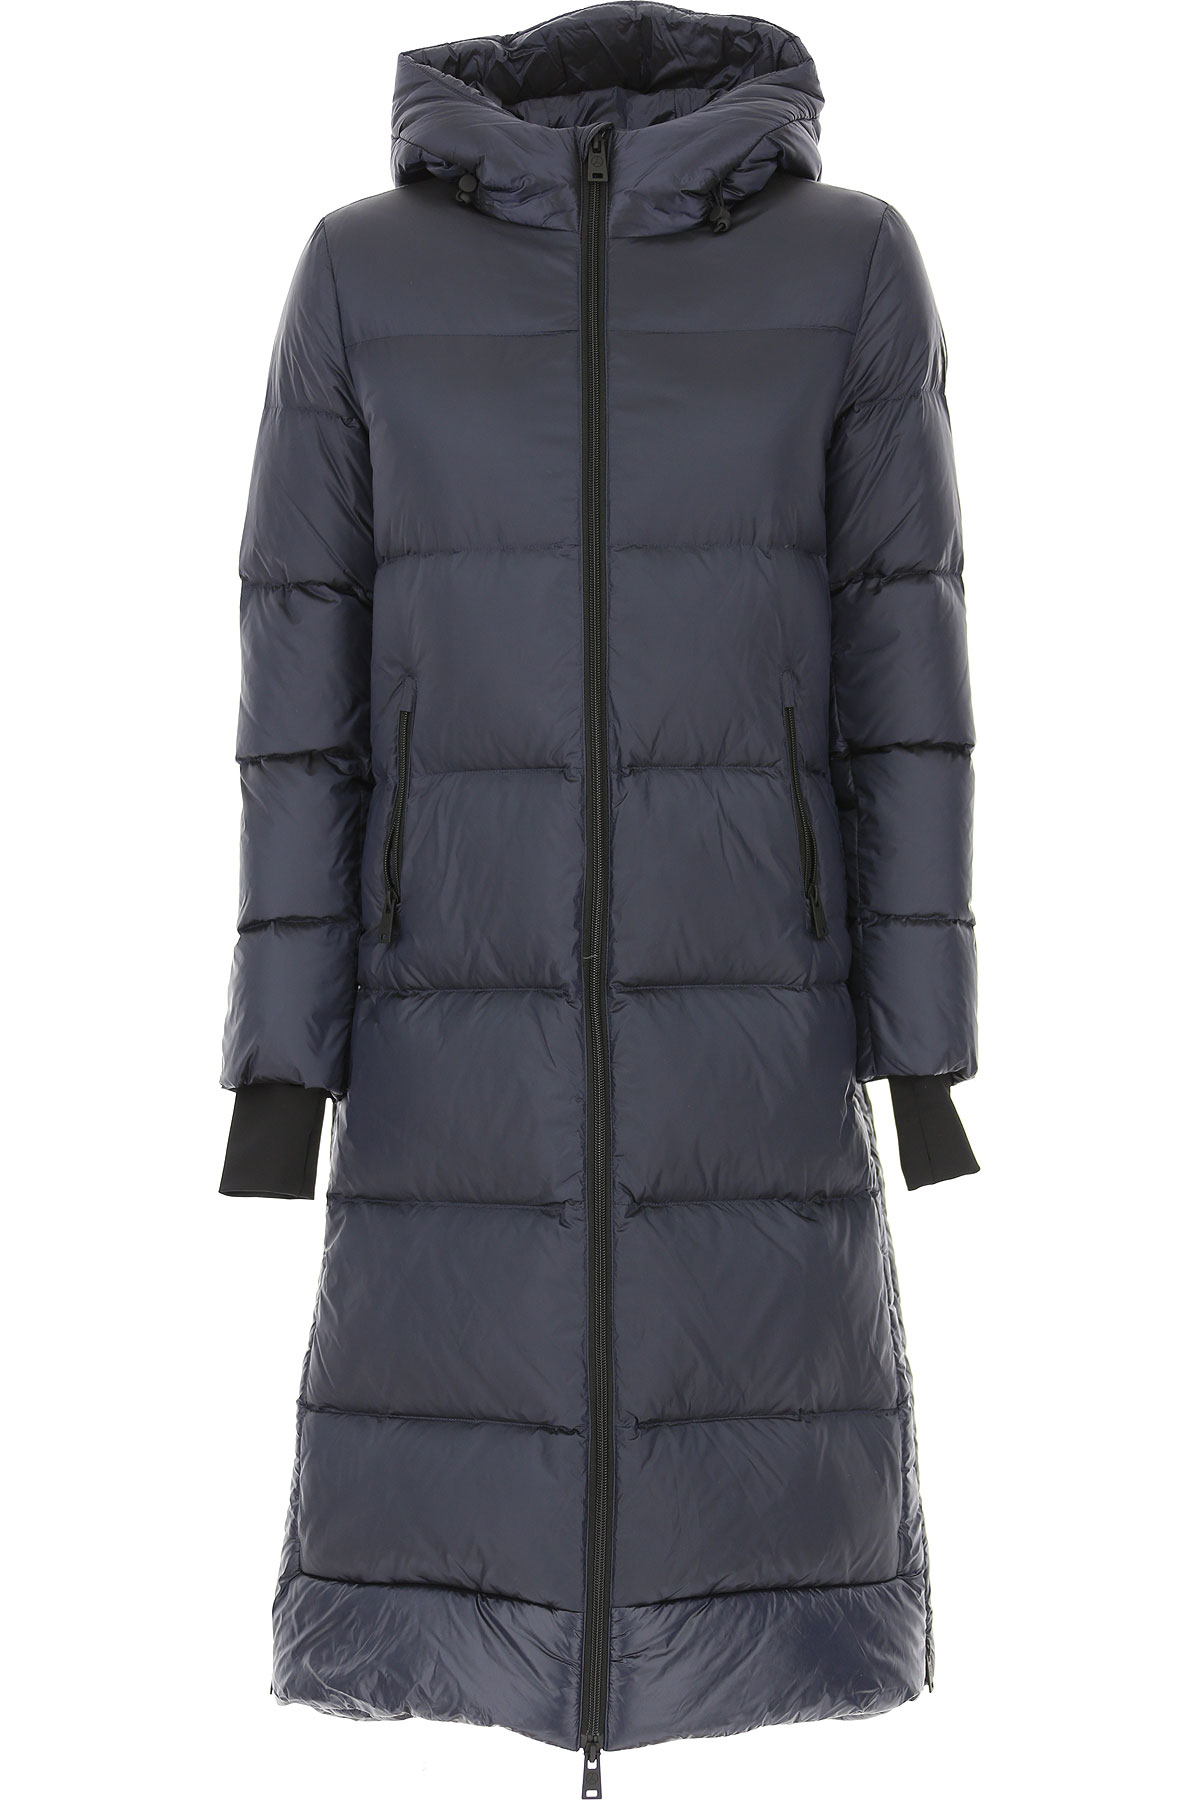 People of Shibuya Down Jacket for Women, Puffer Ski Jacket On Sale, Ink Blue, polyamide, 2019, 4 6